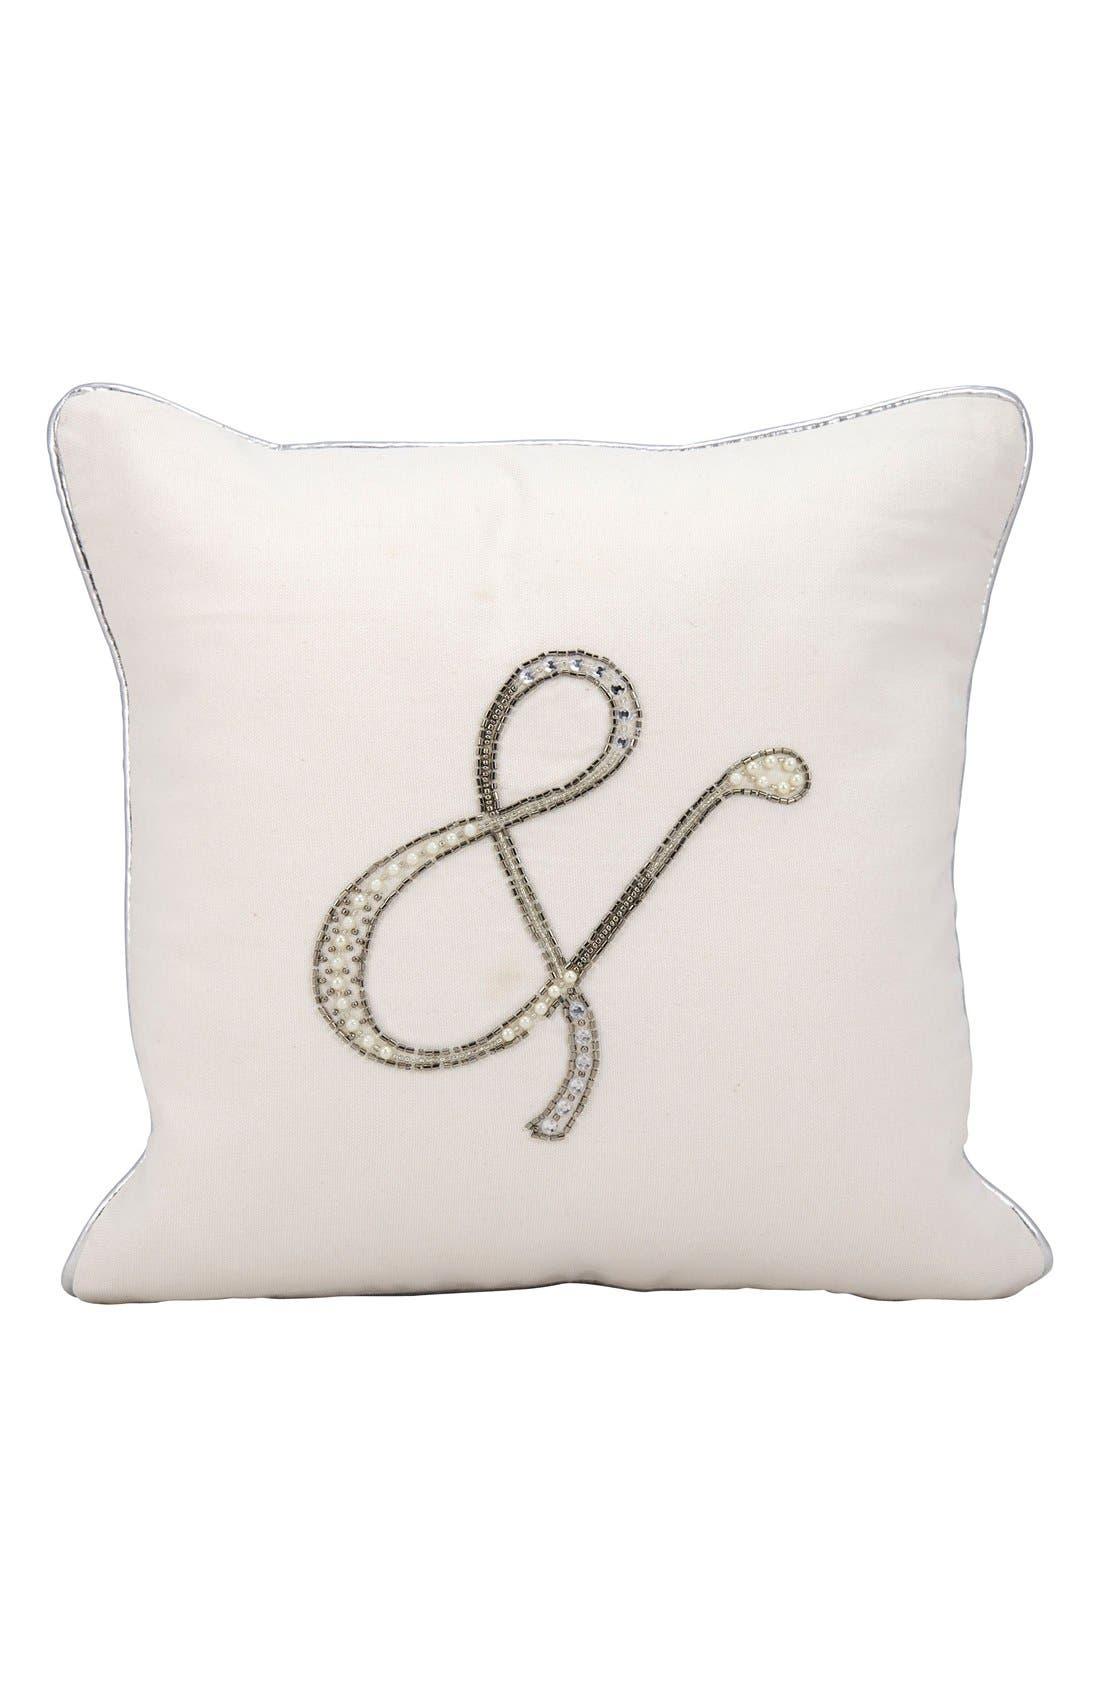 MINA VICTORY Embellished Wedding Pillow